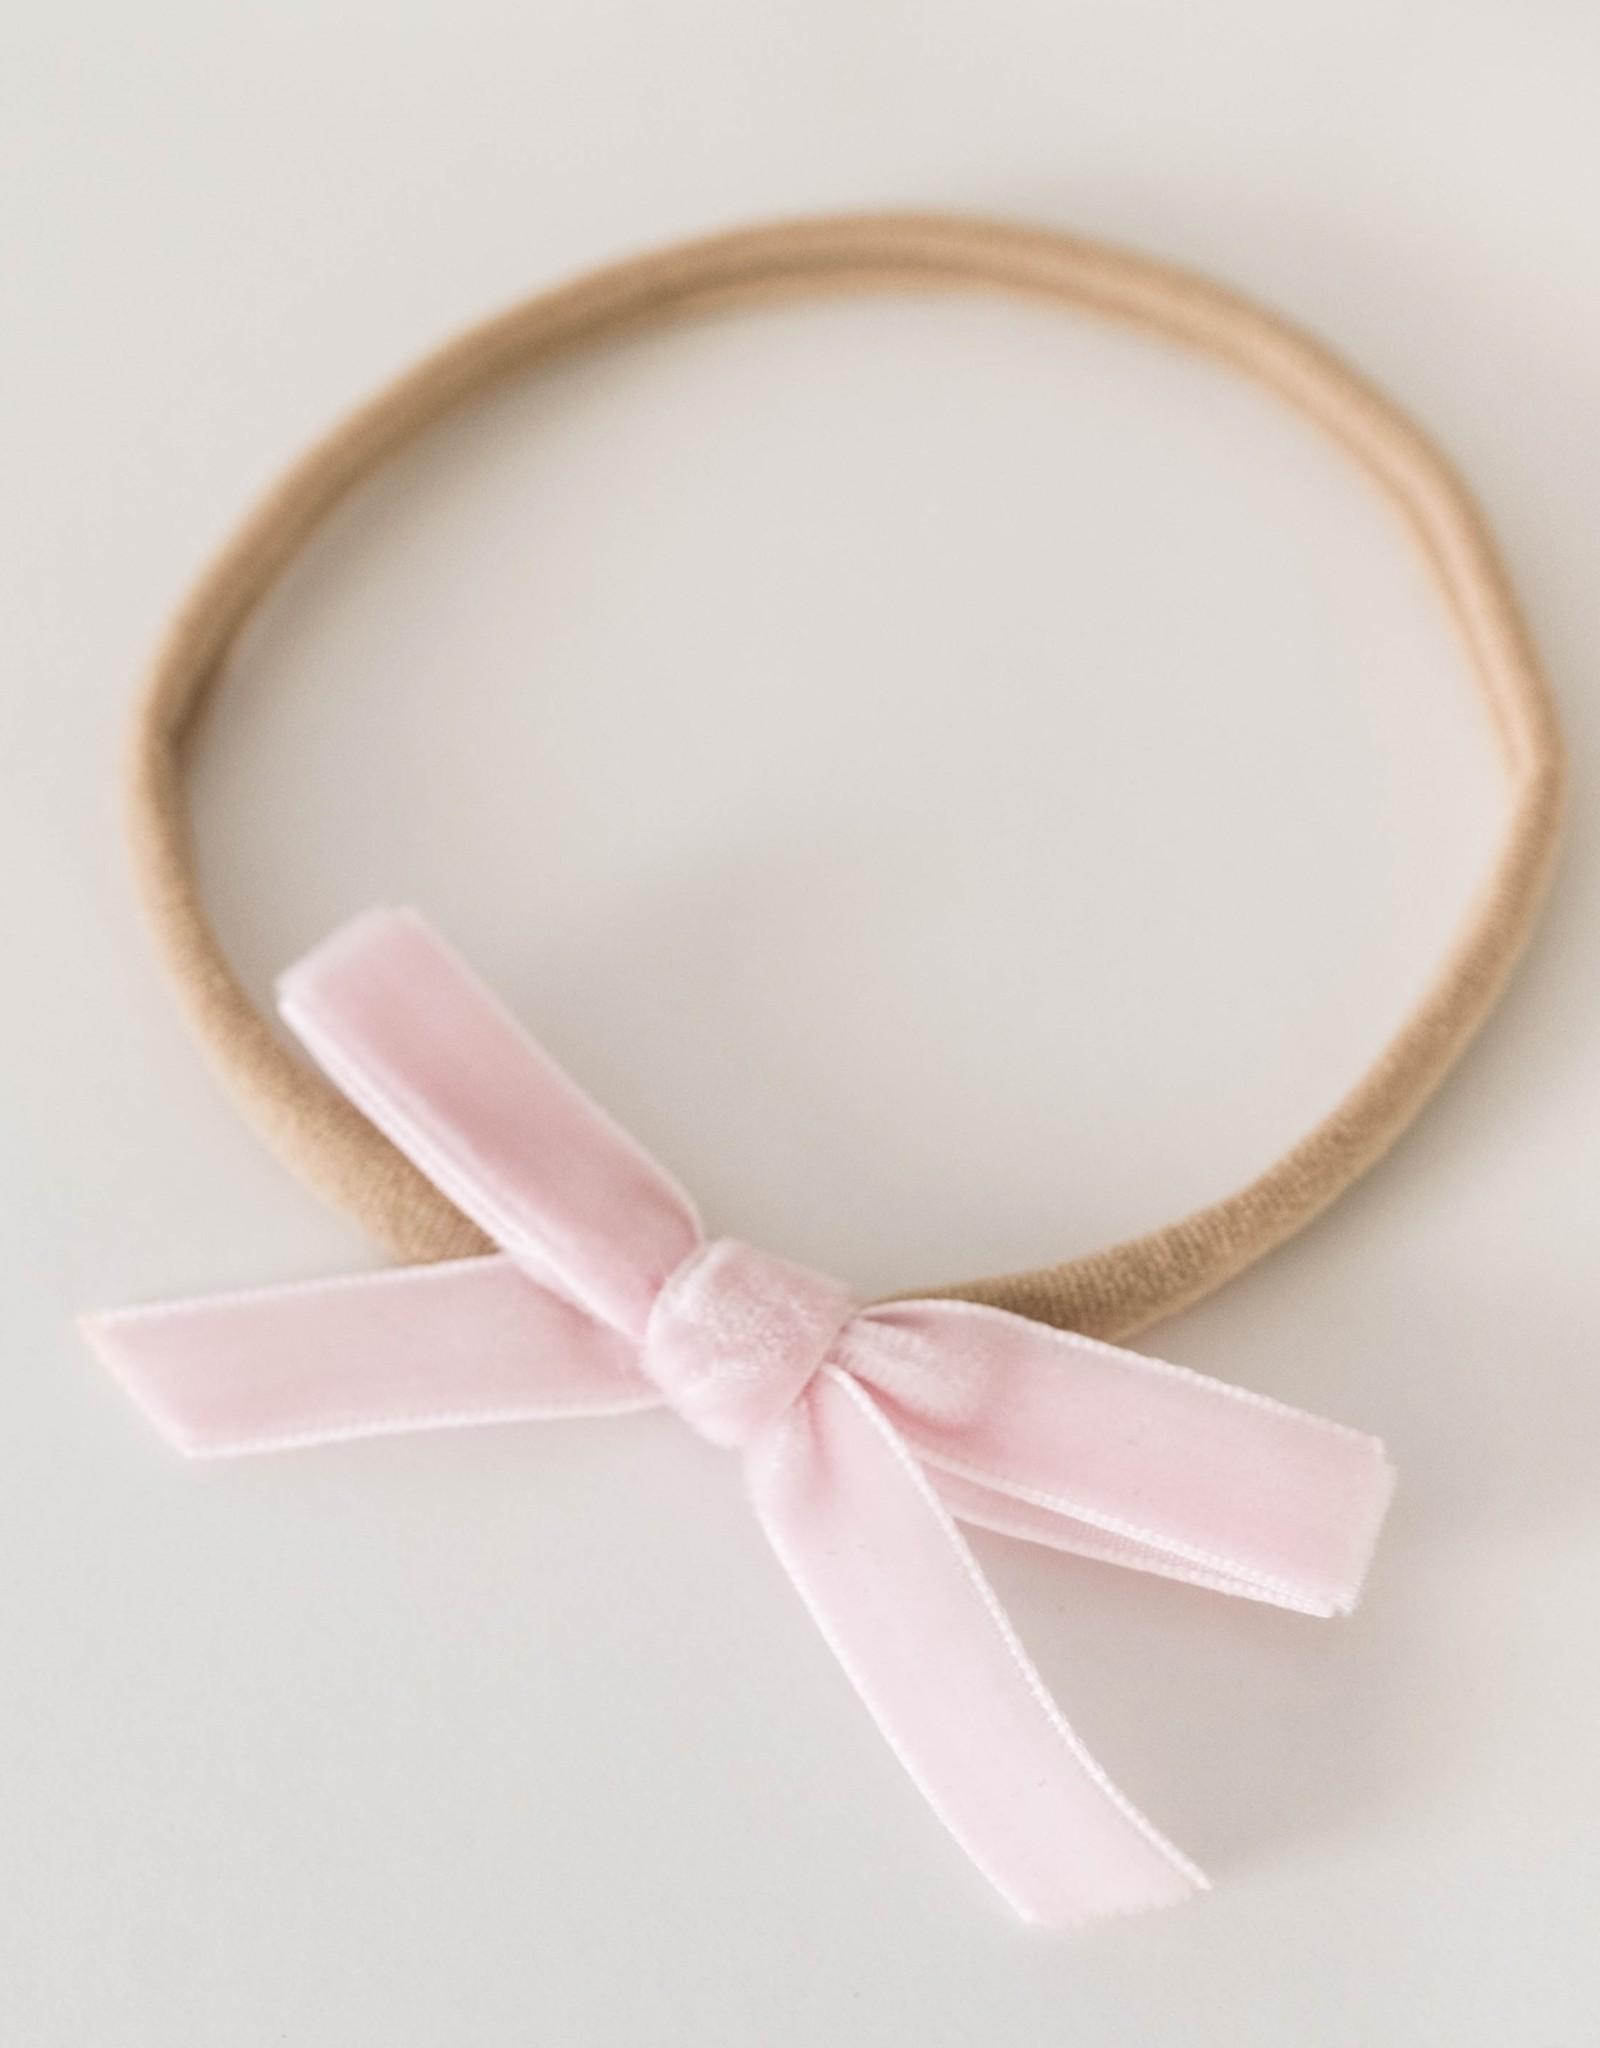 Snuggle Hunny Snuggle Hunny - Rose Pink Velvet Bow